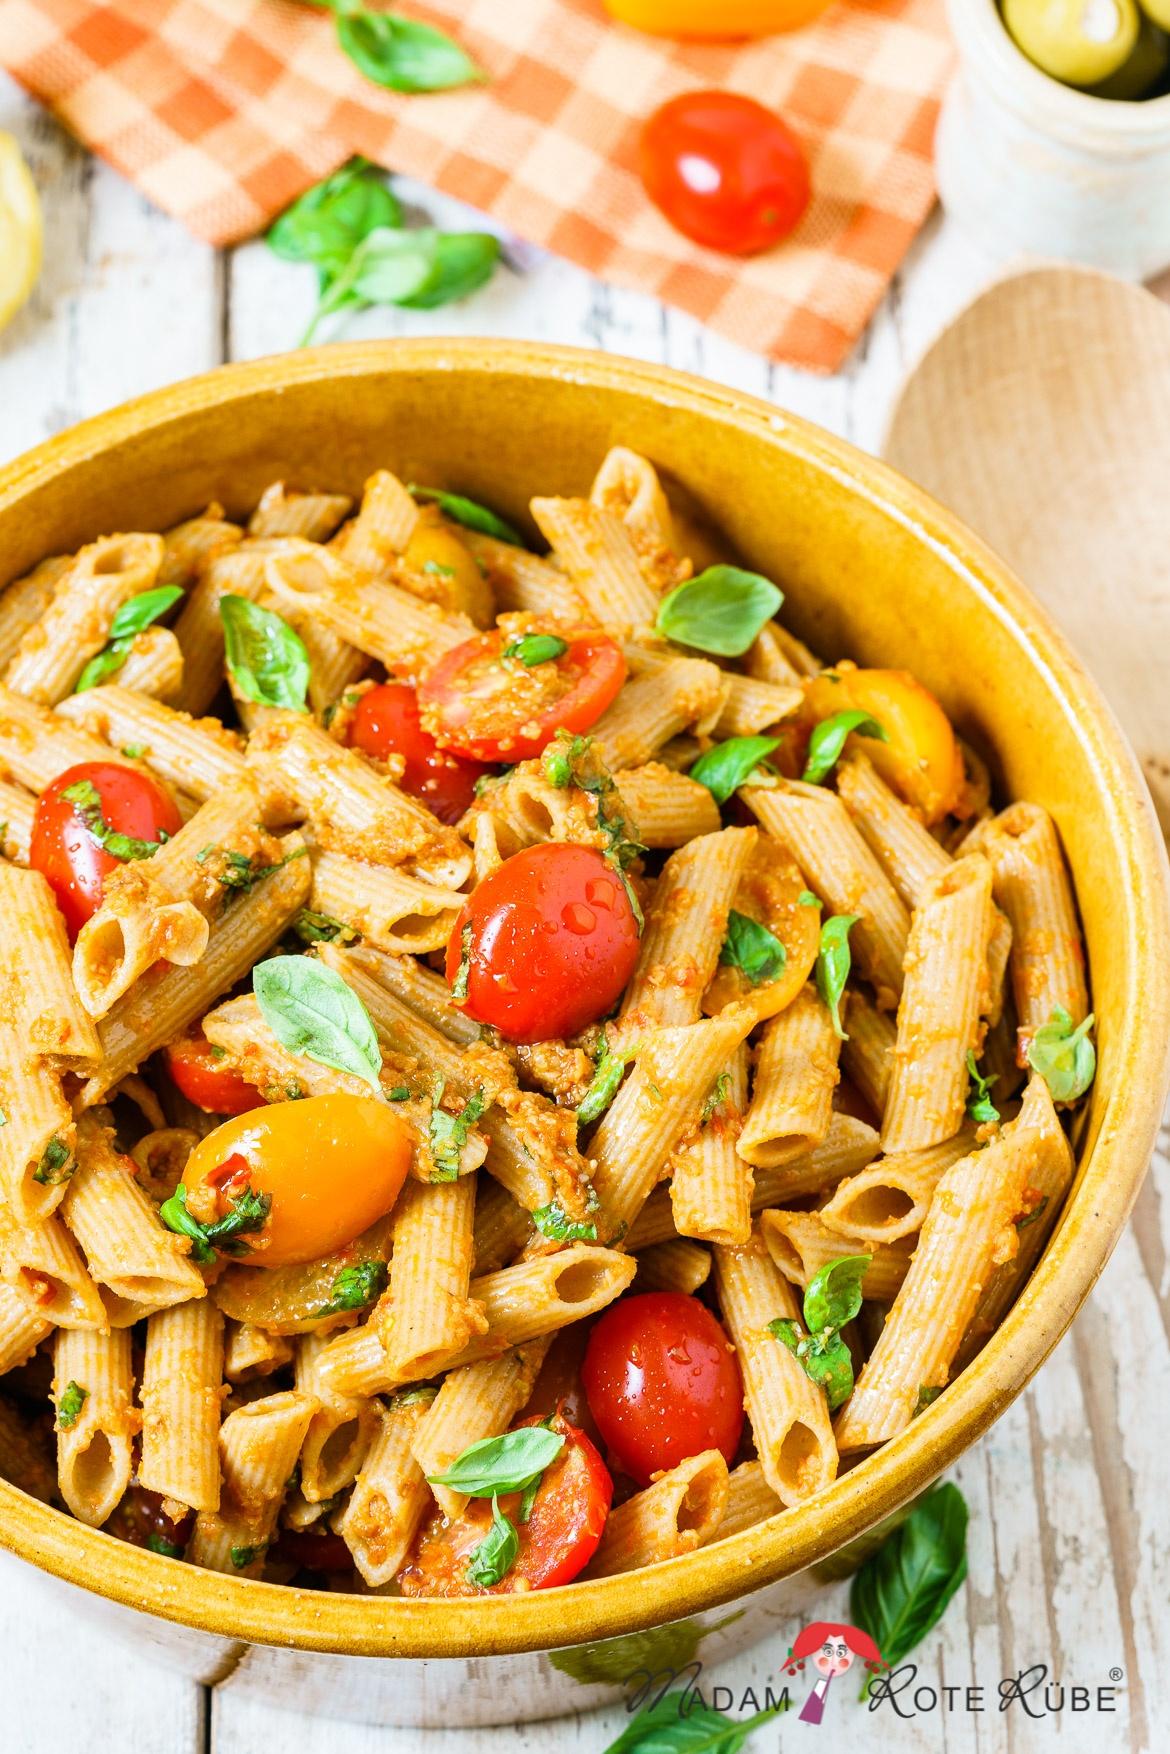 Madam Rote Rübe - Tomaten-Nudelsalat mit Oliven-Tomaten-Dressing